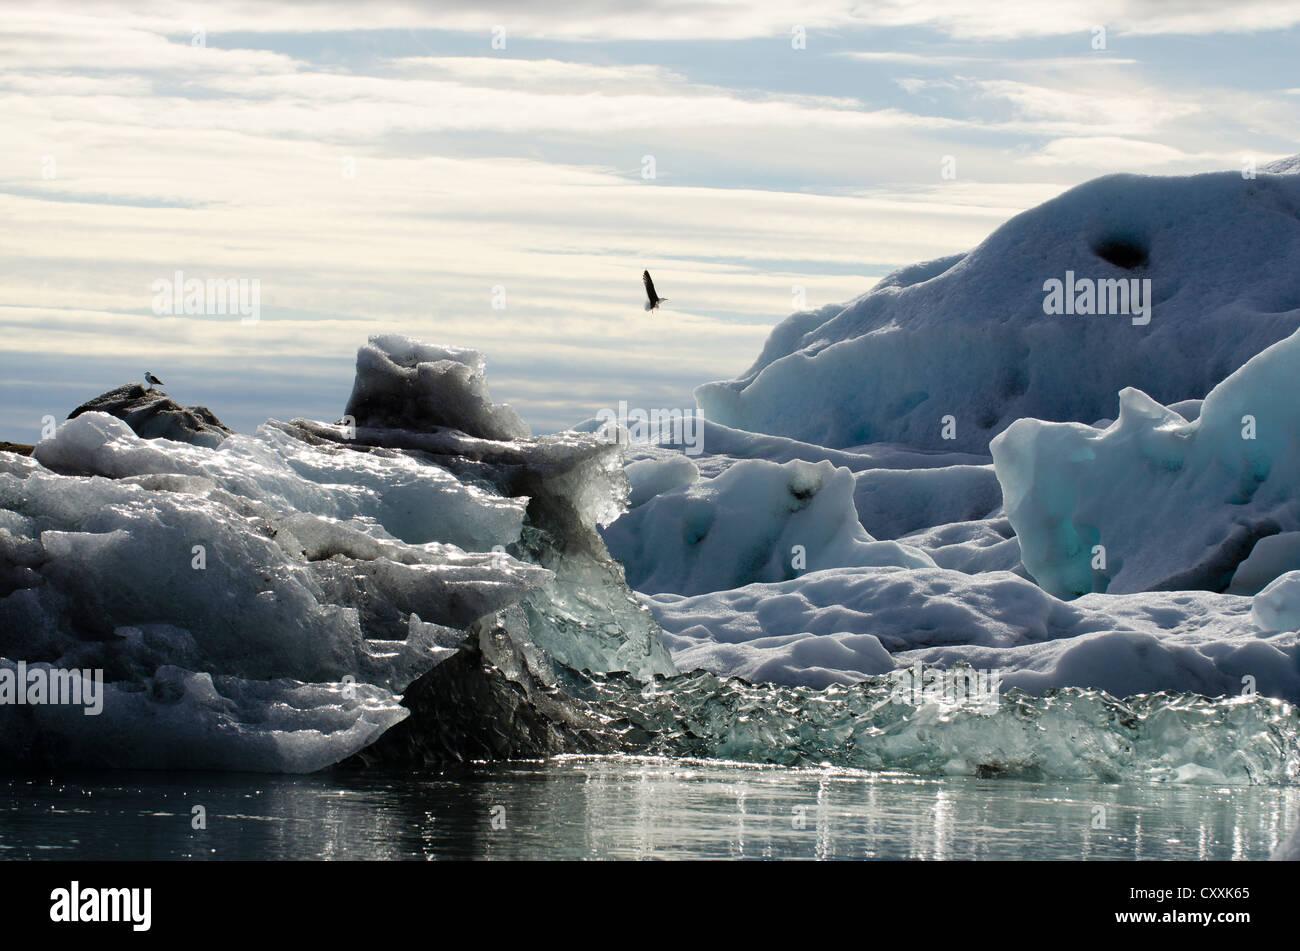 Gulls (Laridae) over blue and black ash-coloured icebergs and ice crystals, glacier lagoon of Joekulsárlón - Stock Image